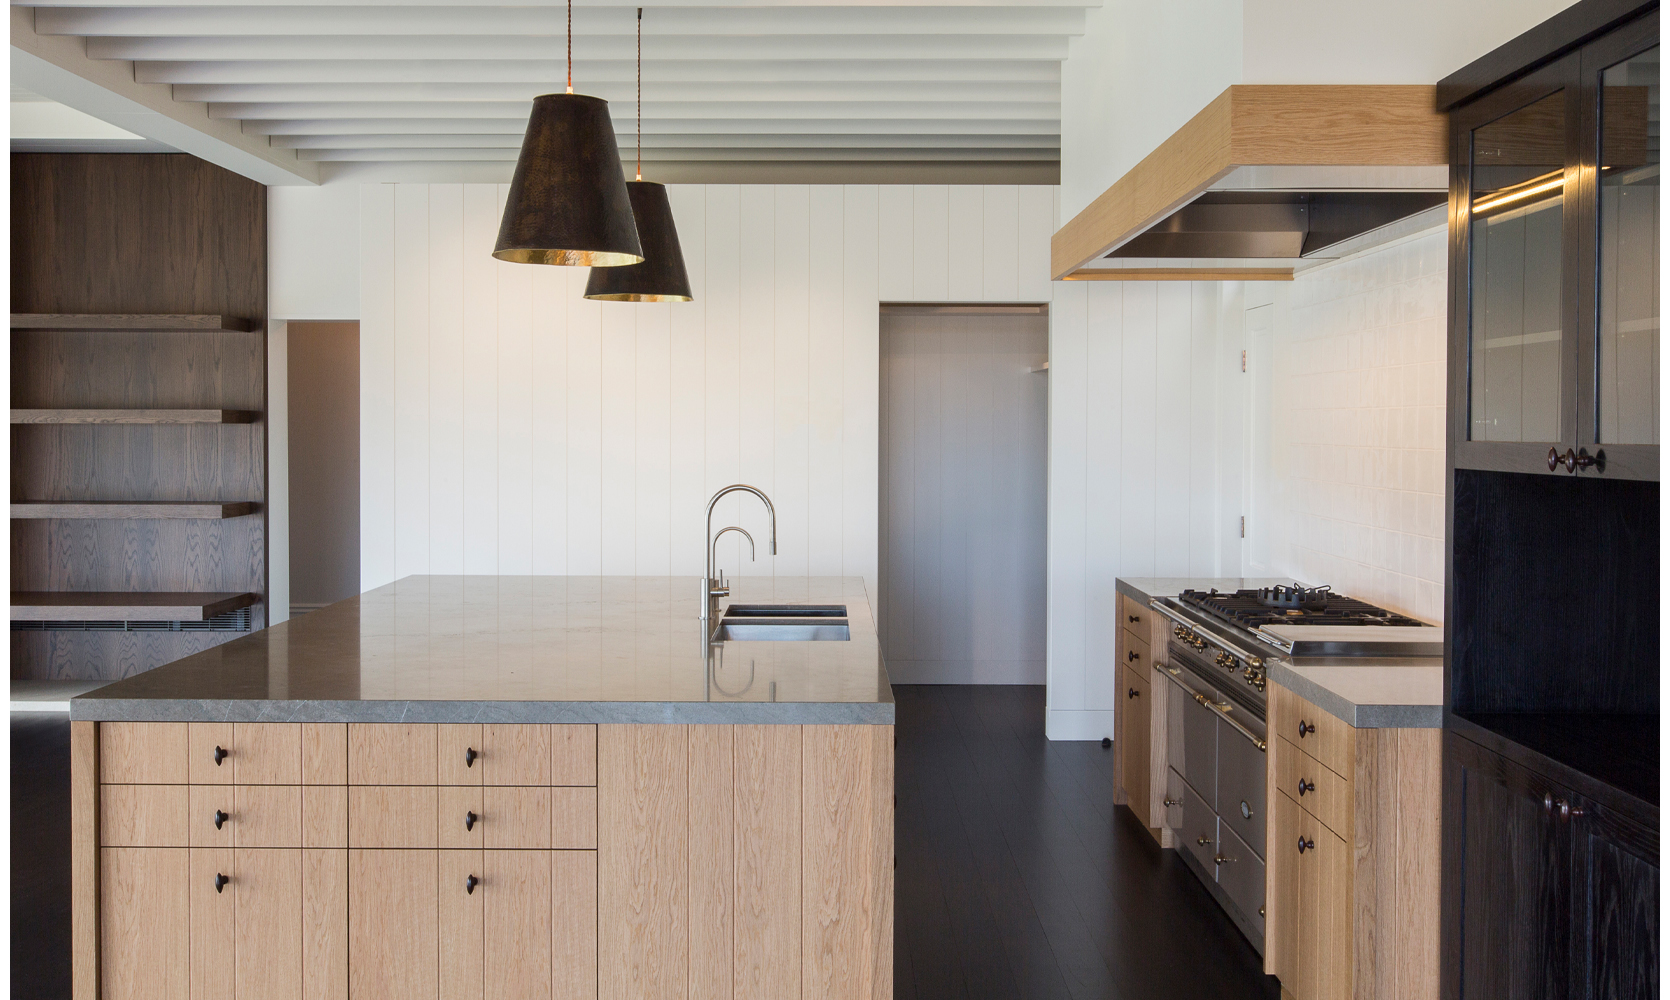 maek-luxury-home-design-inspiration-toodyay-kitchen-gallery-6.jpg